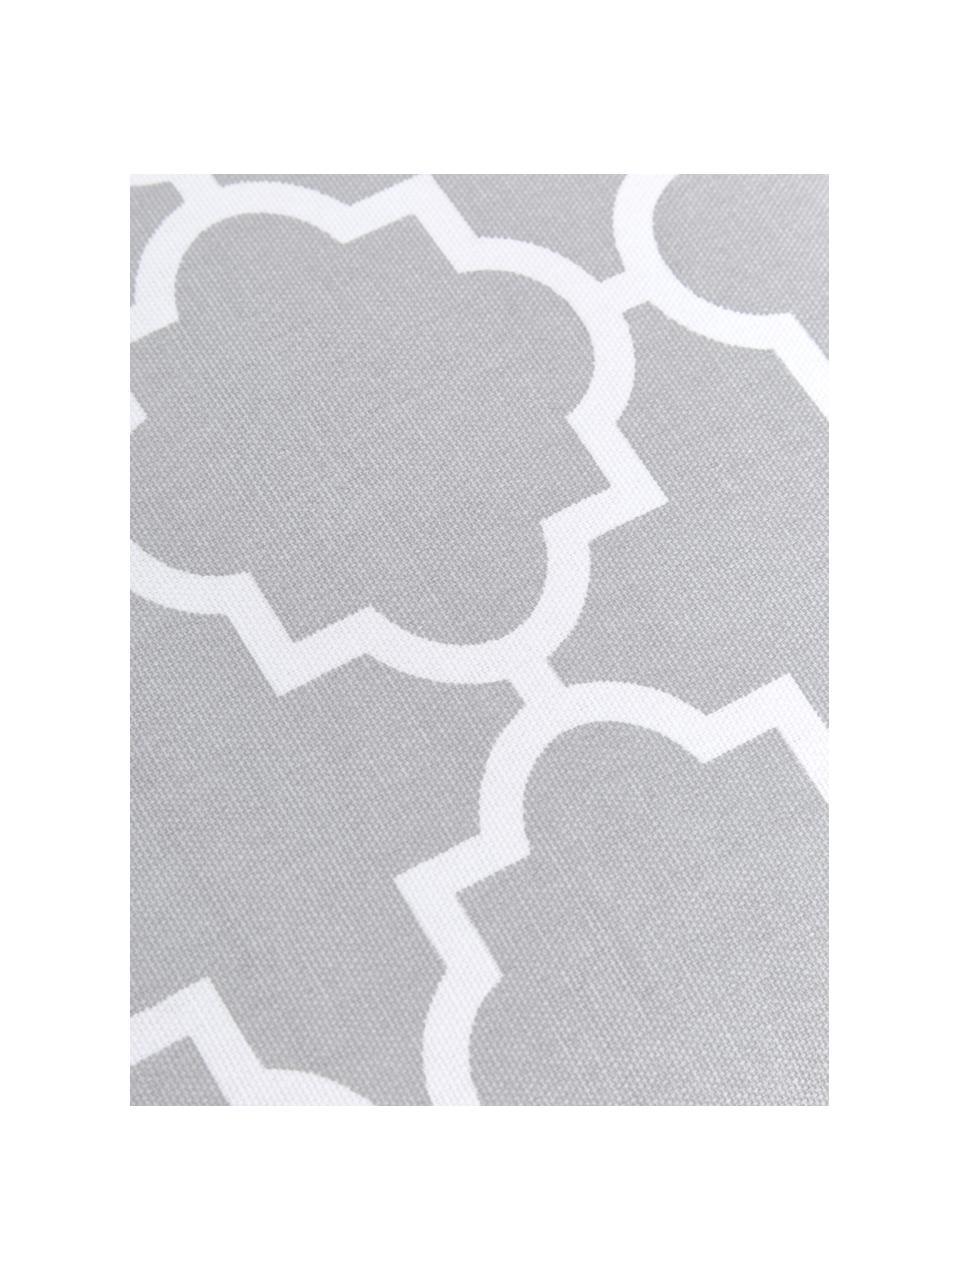 Hohes Sitzkissen Lana in Hellgrau/Weiß, Bezug: 100% Baumwolle, Grau, 40 x 40 cm